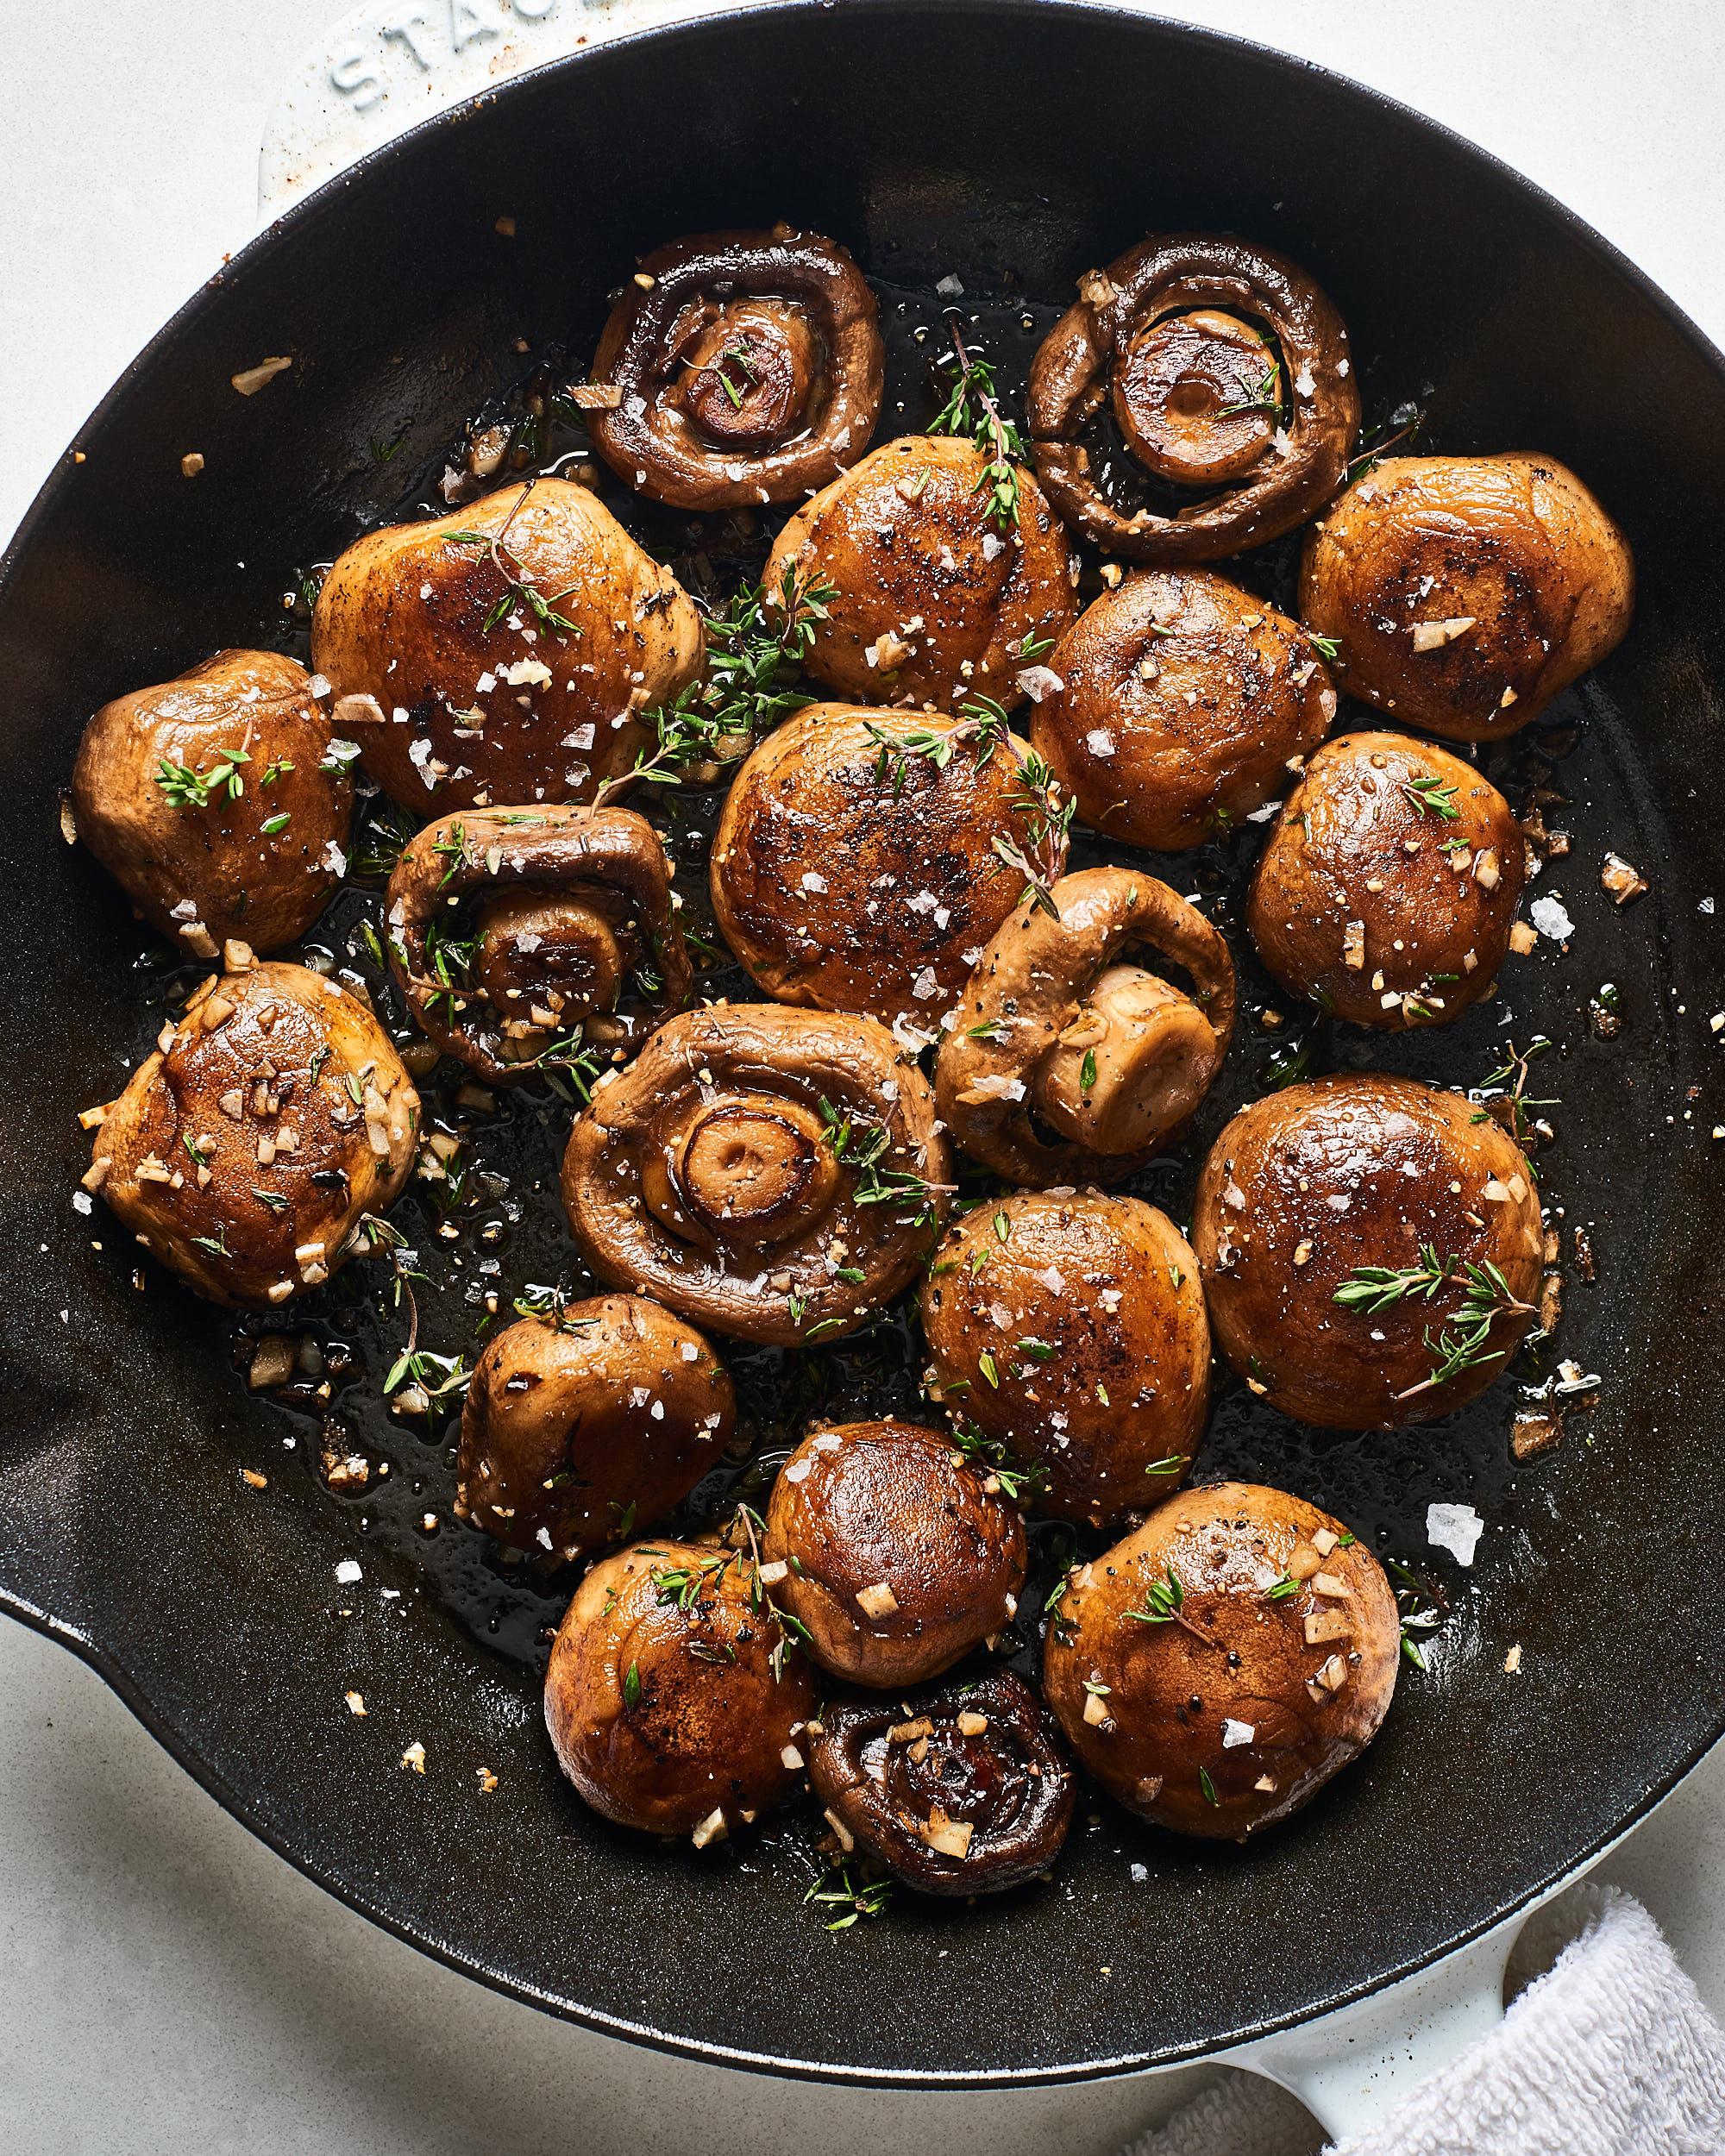 11 Popular Mushroom Recipes to Make This Weekend